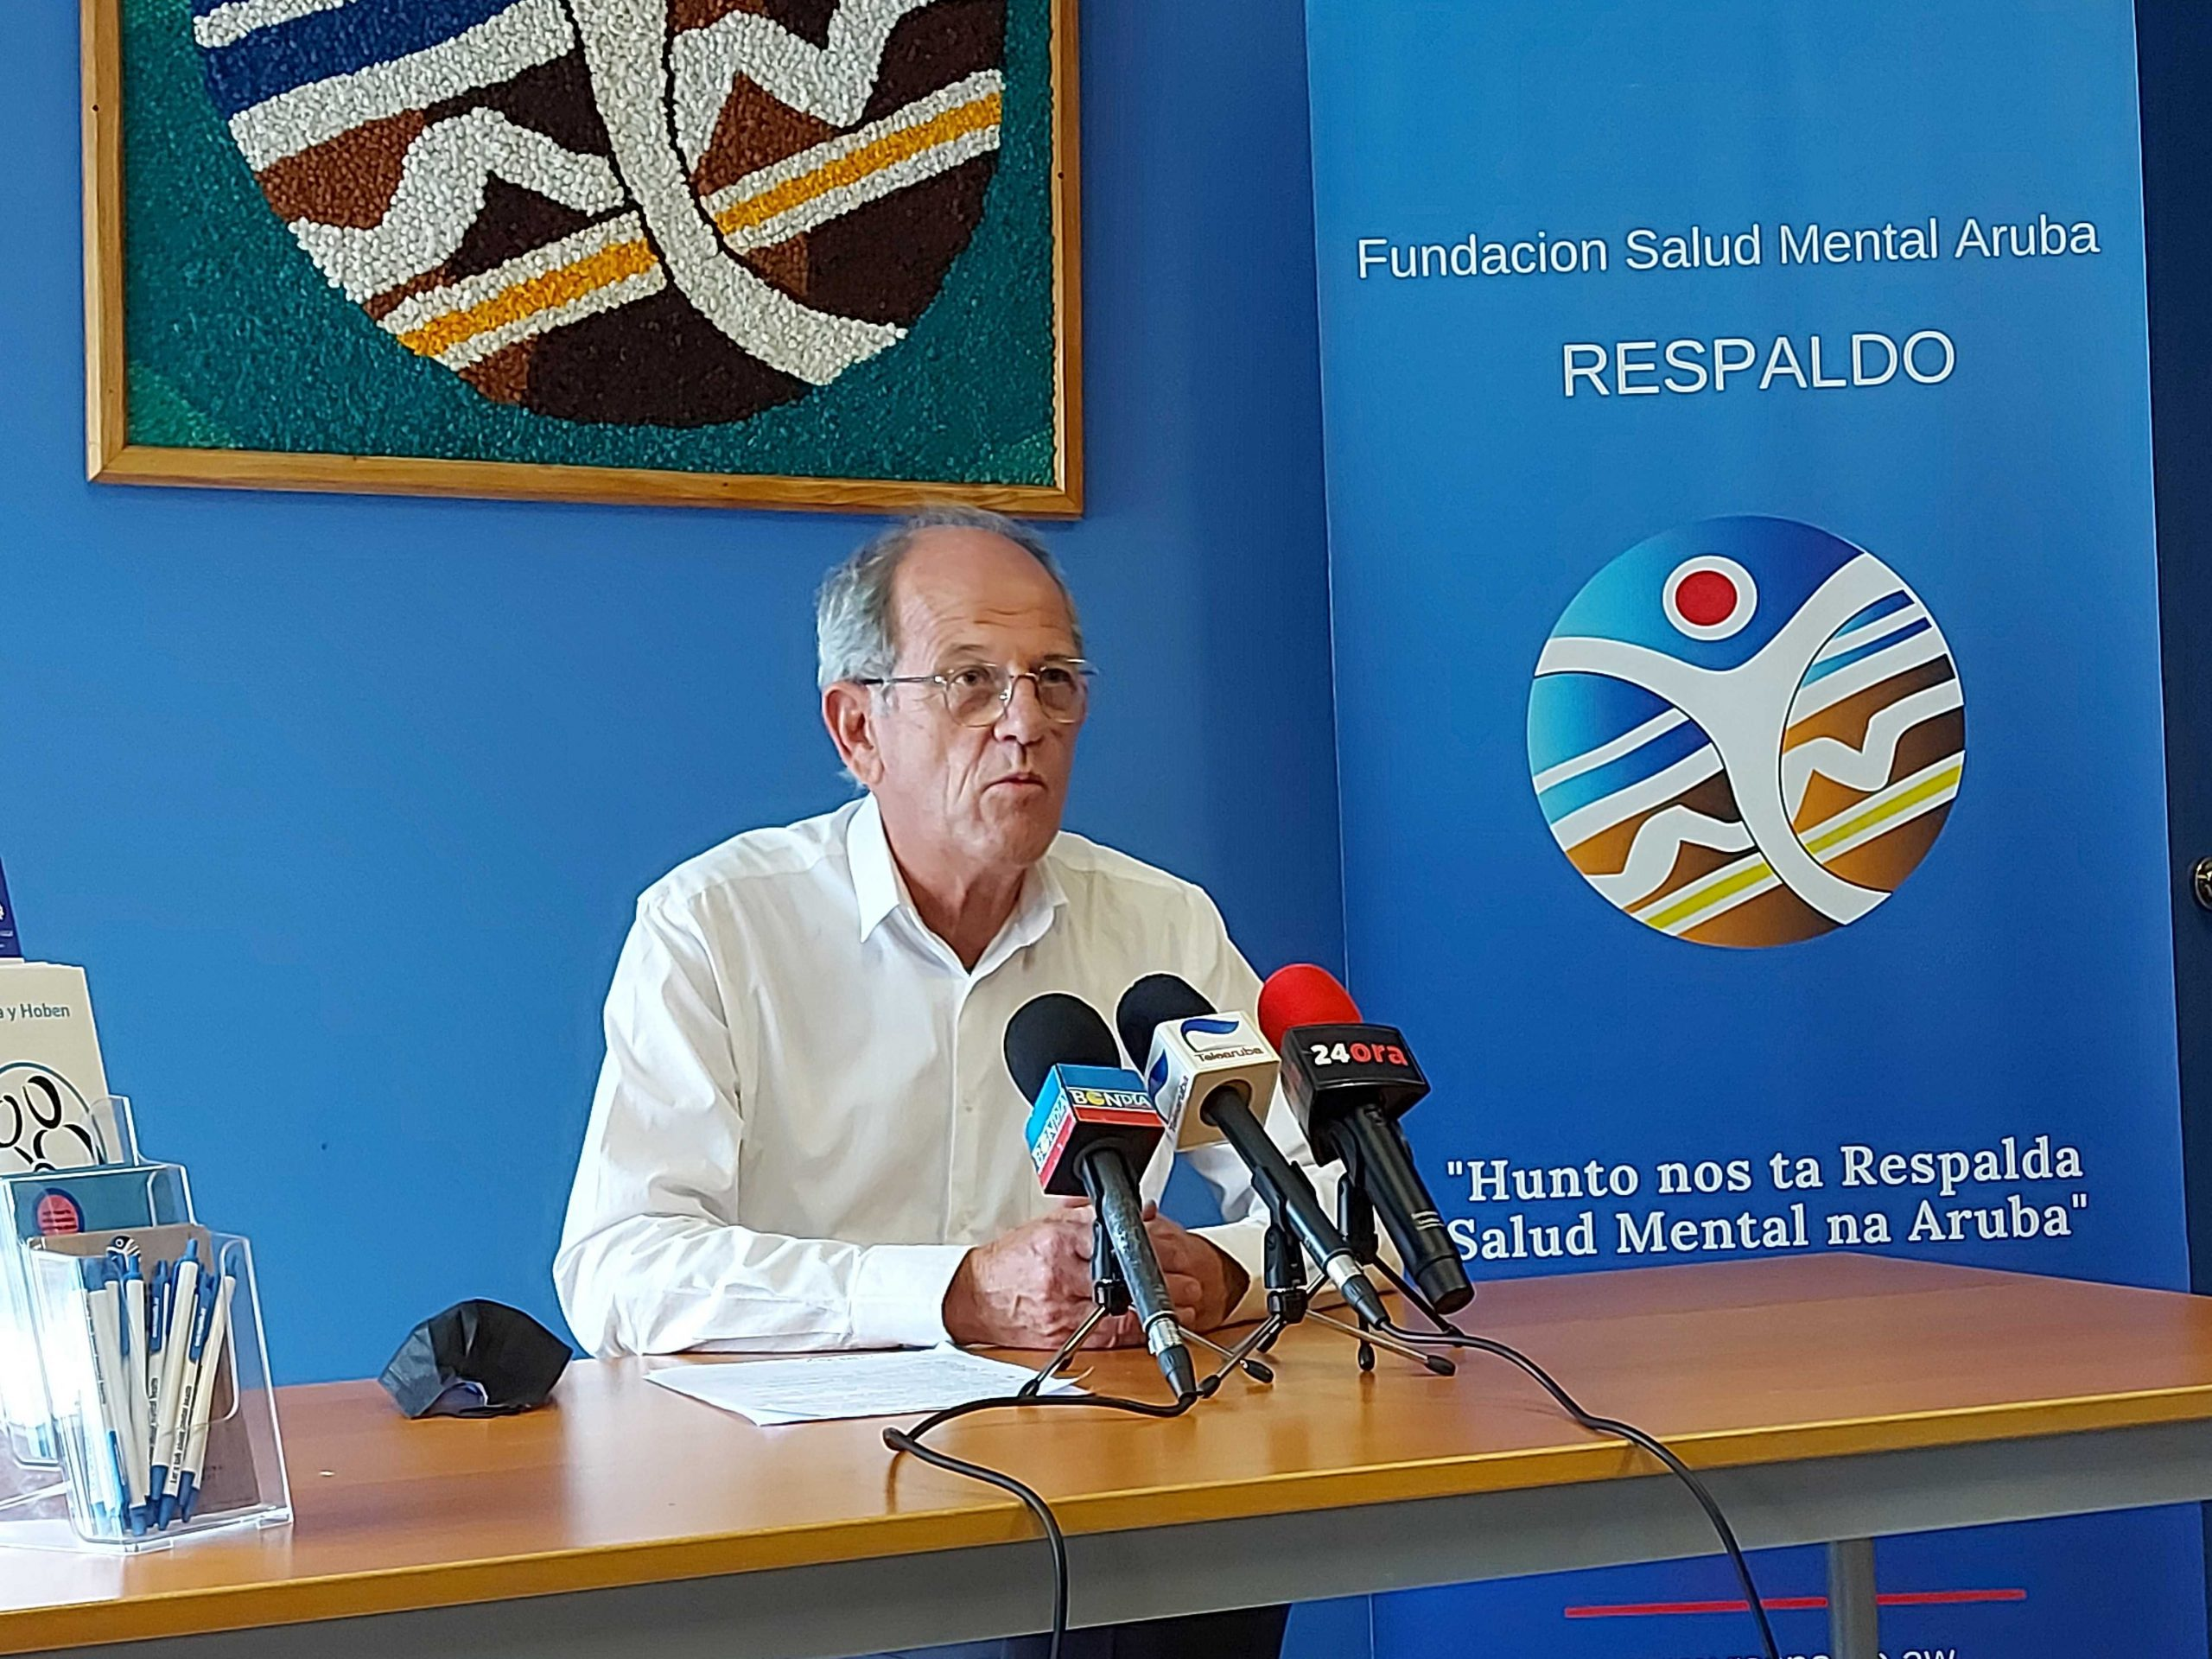 Fundacion Respaldo: Aruba ta den un gran peliger y nos ta spera pa haya solucion pa esaki